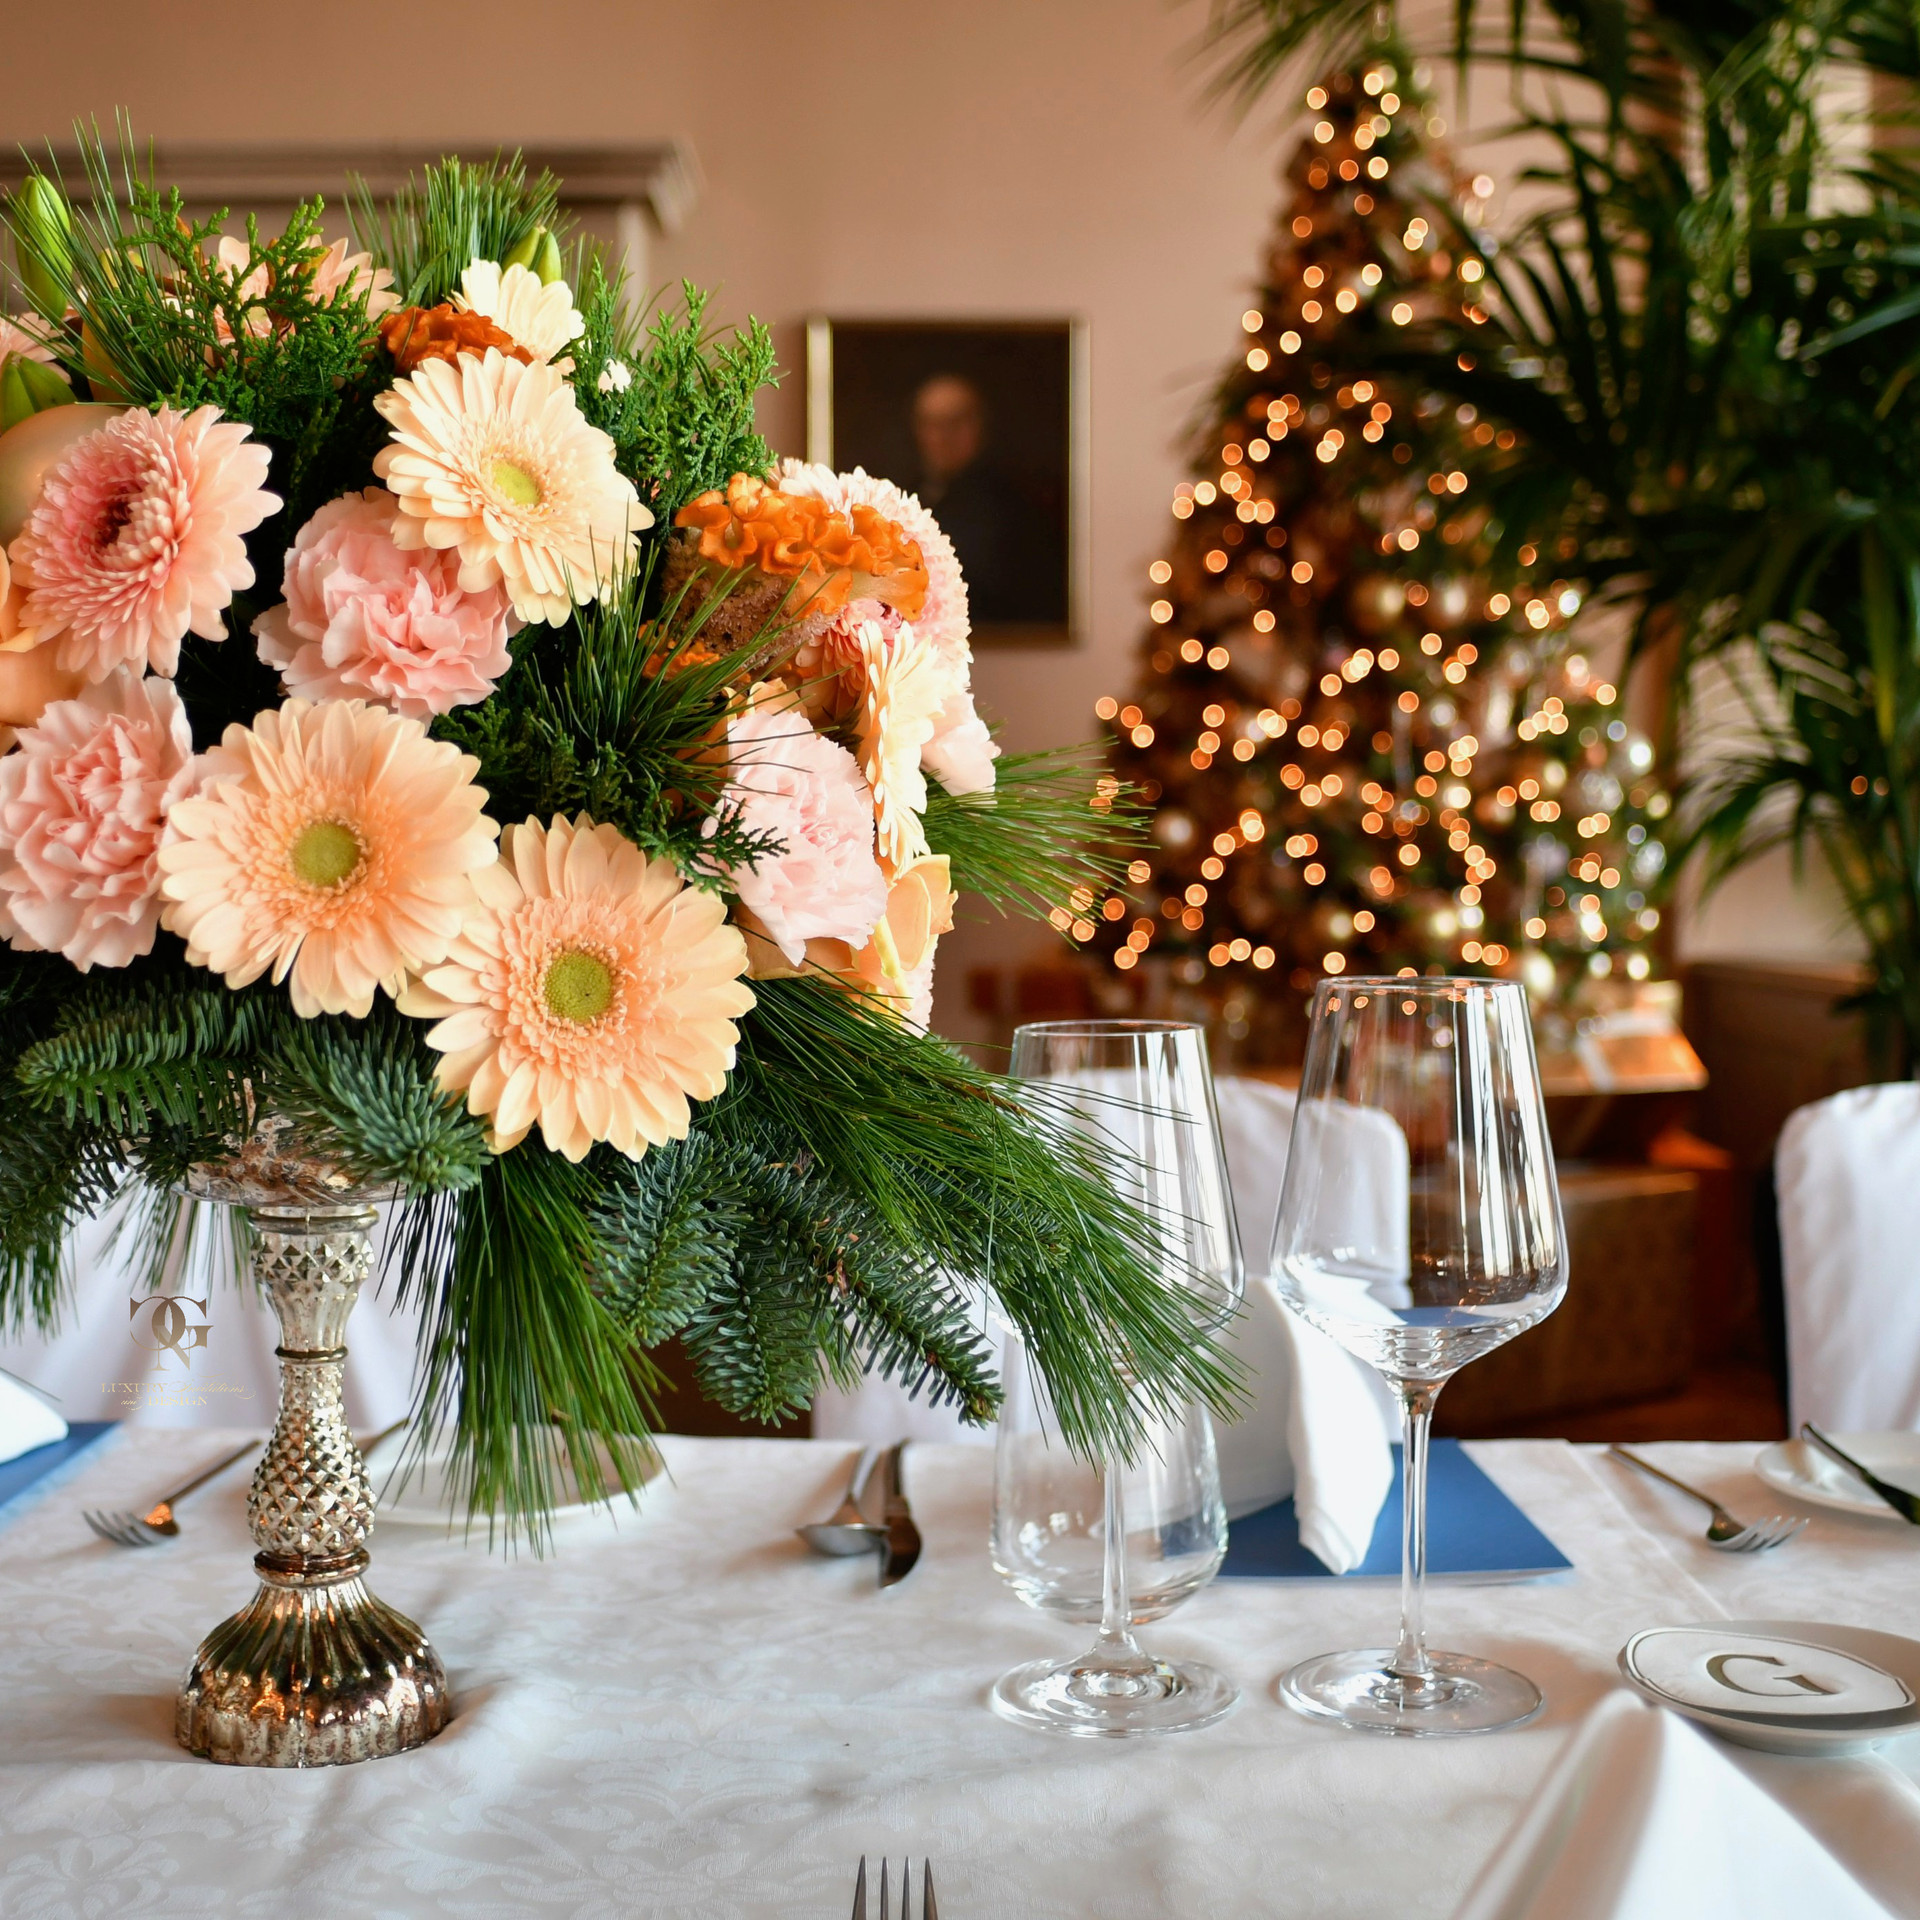 Weihnachtsessen Hugo Boss im Hotel Château Gütsch